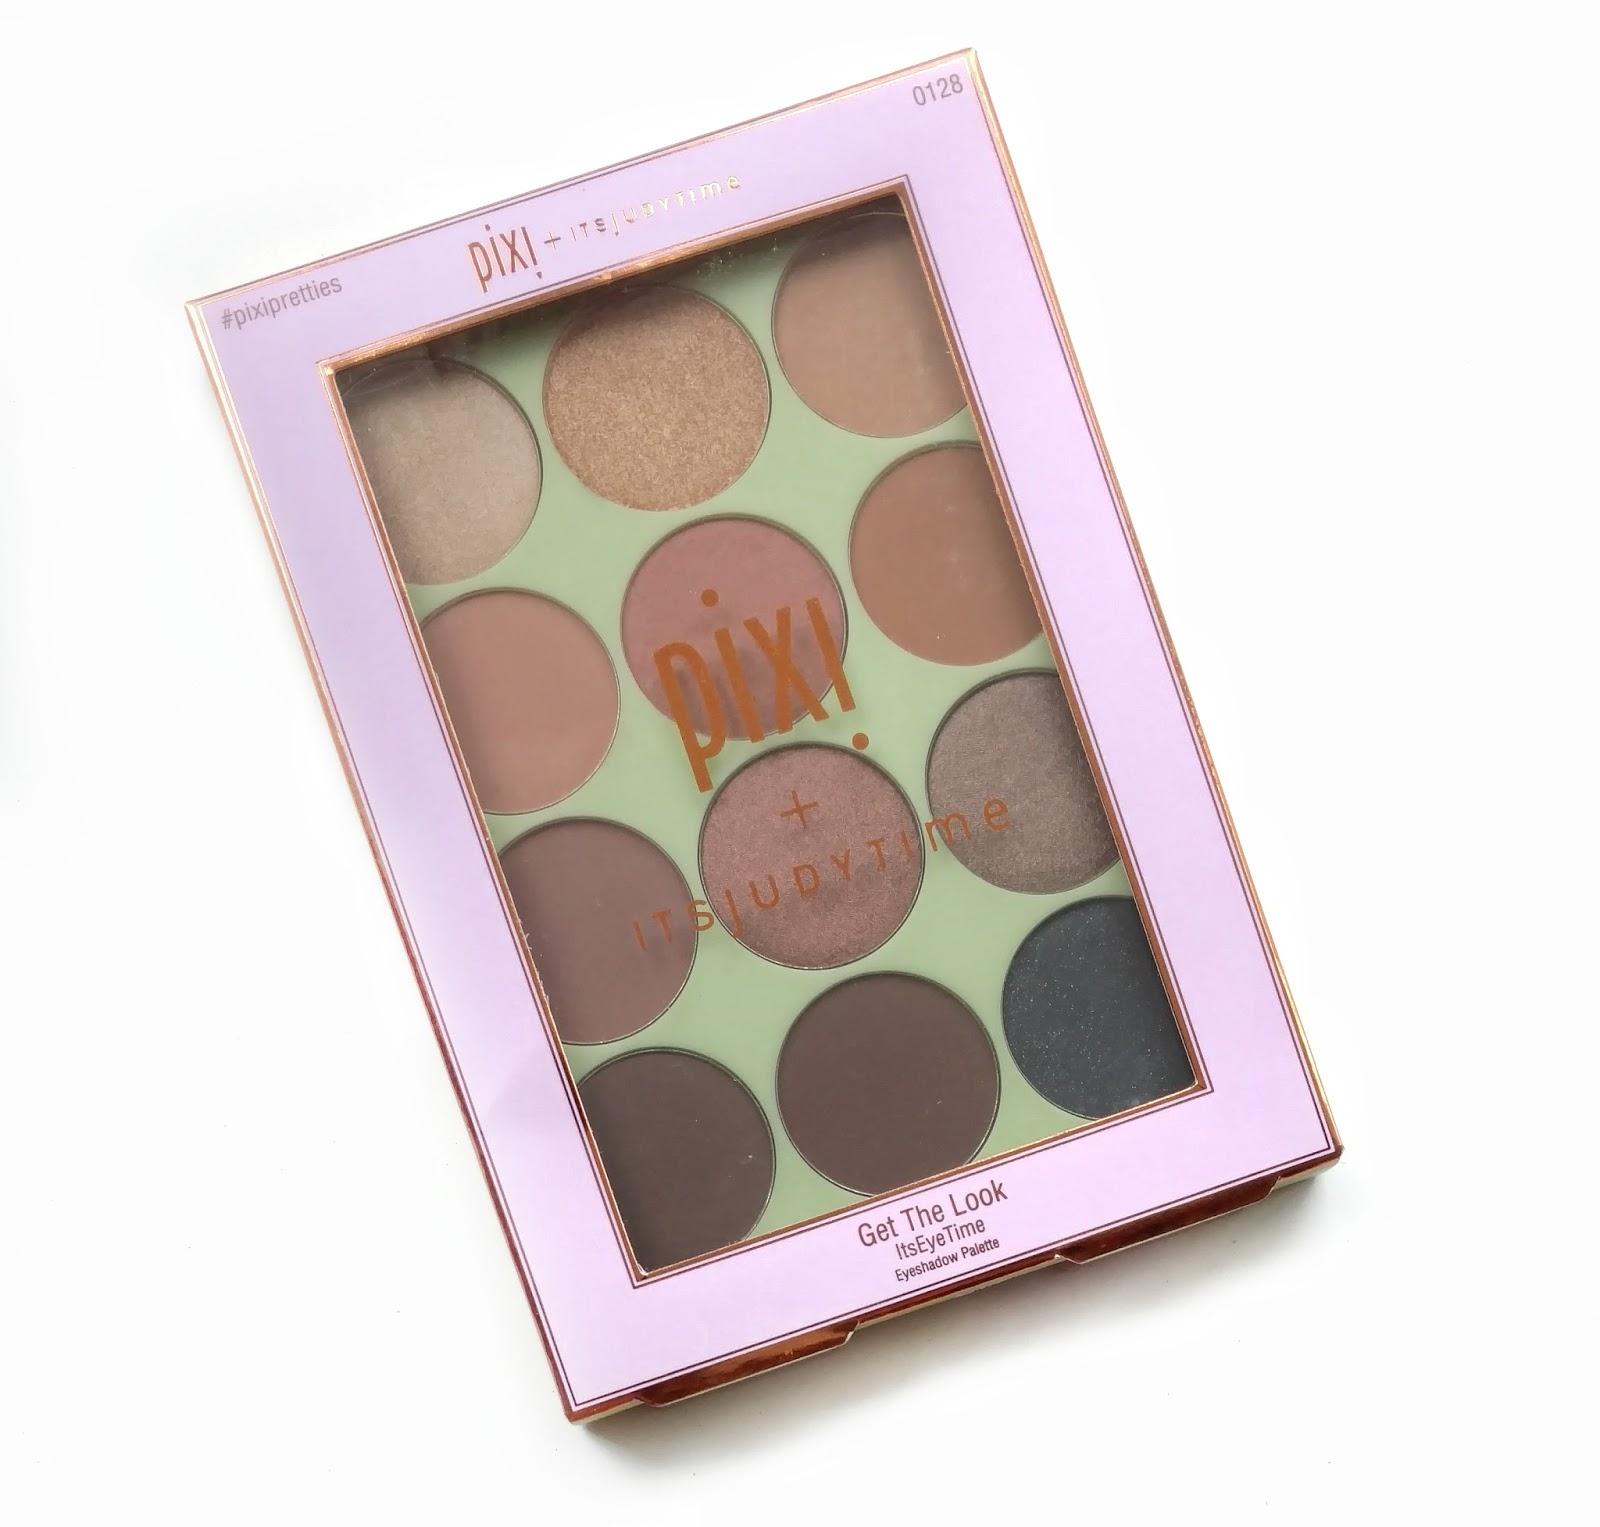 pixi itsjudytime eyeshadow palette review